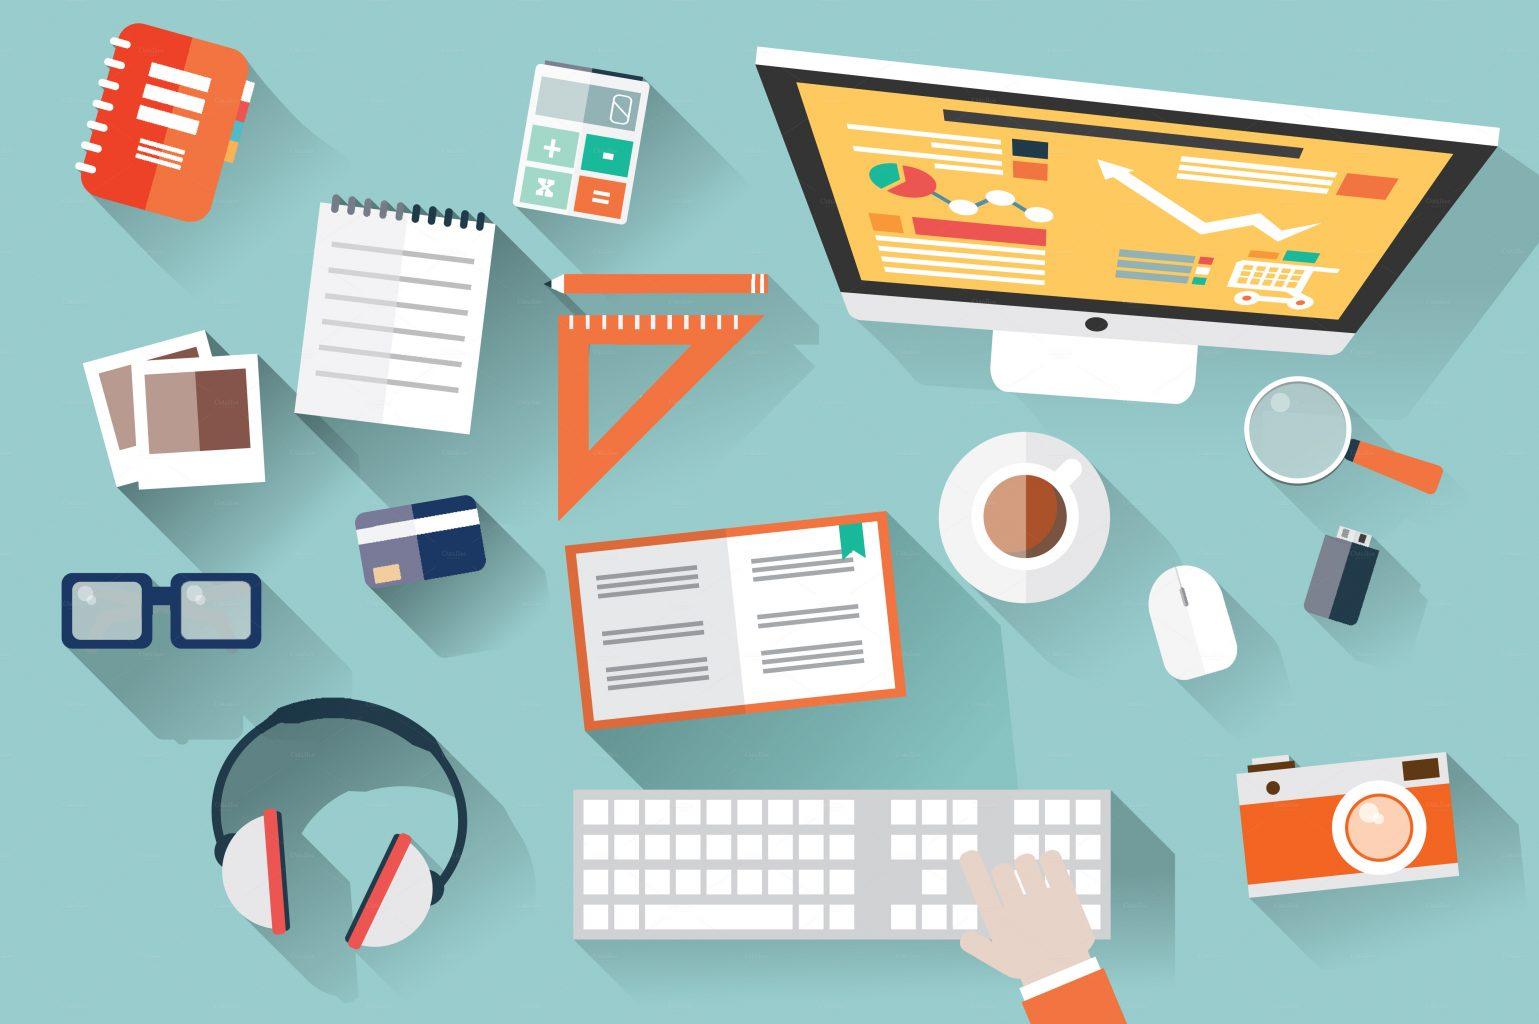 Key Digital Marketing Services